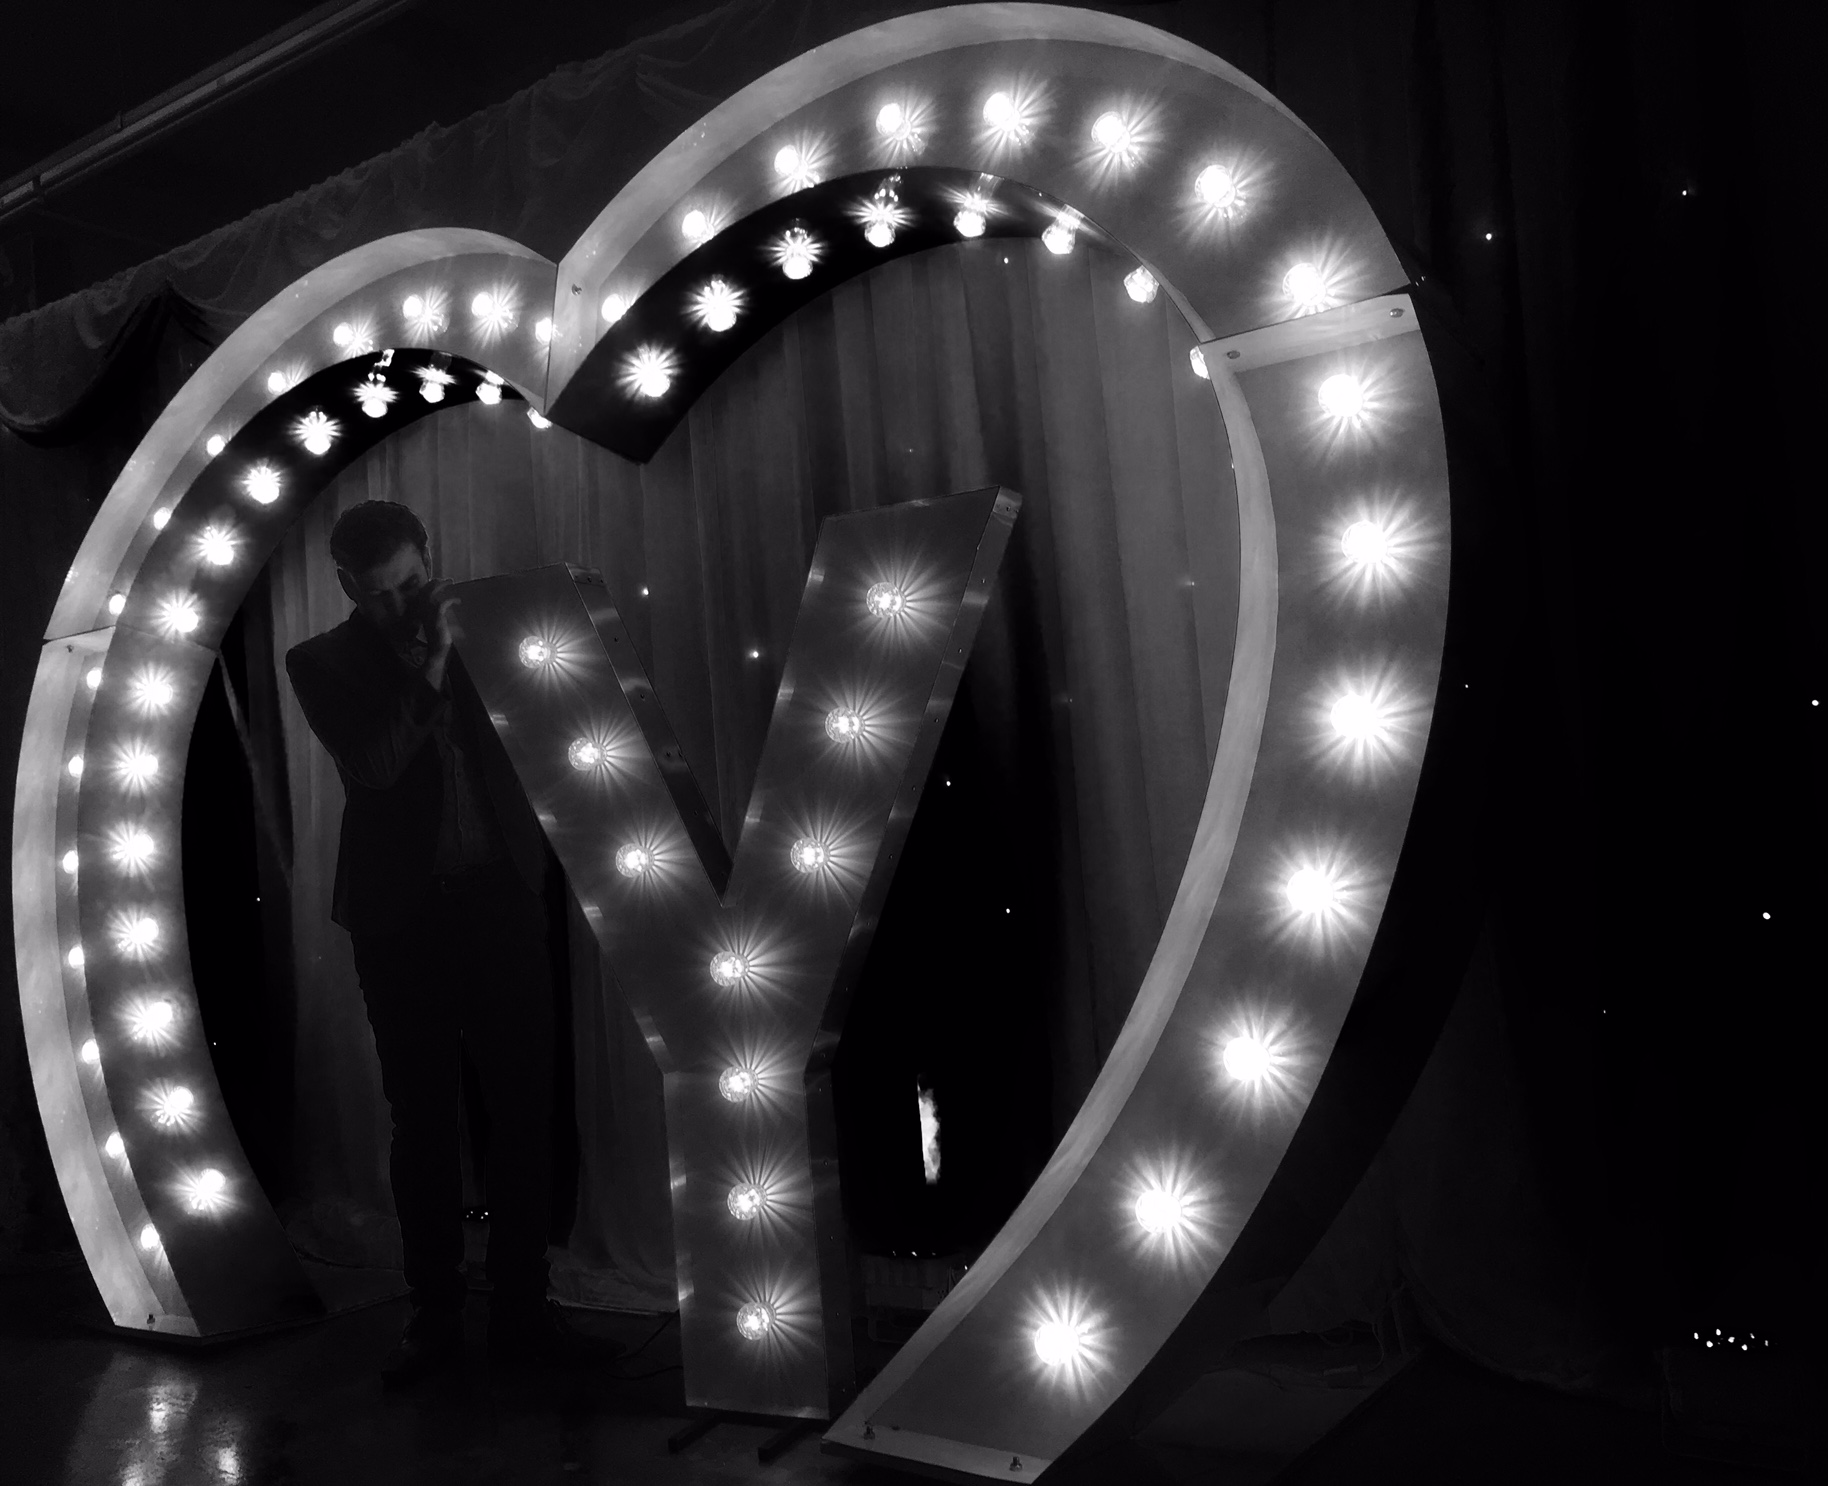 LOVEheart1